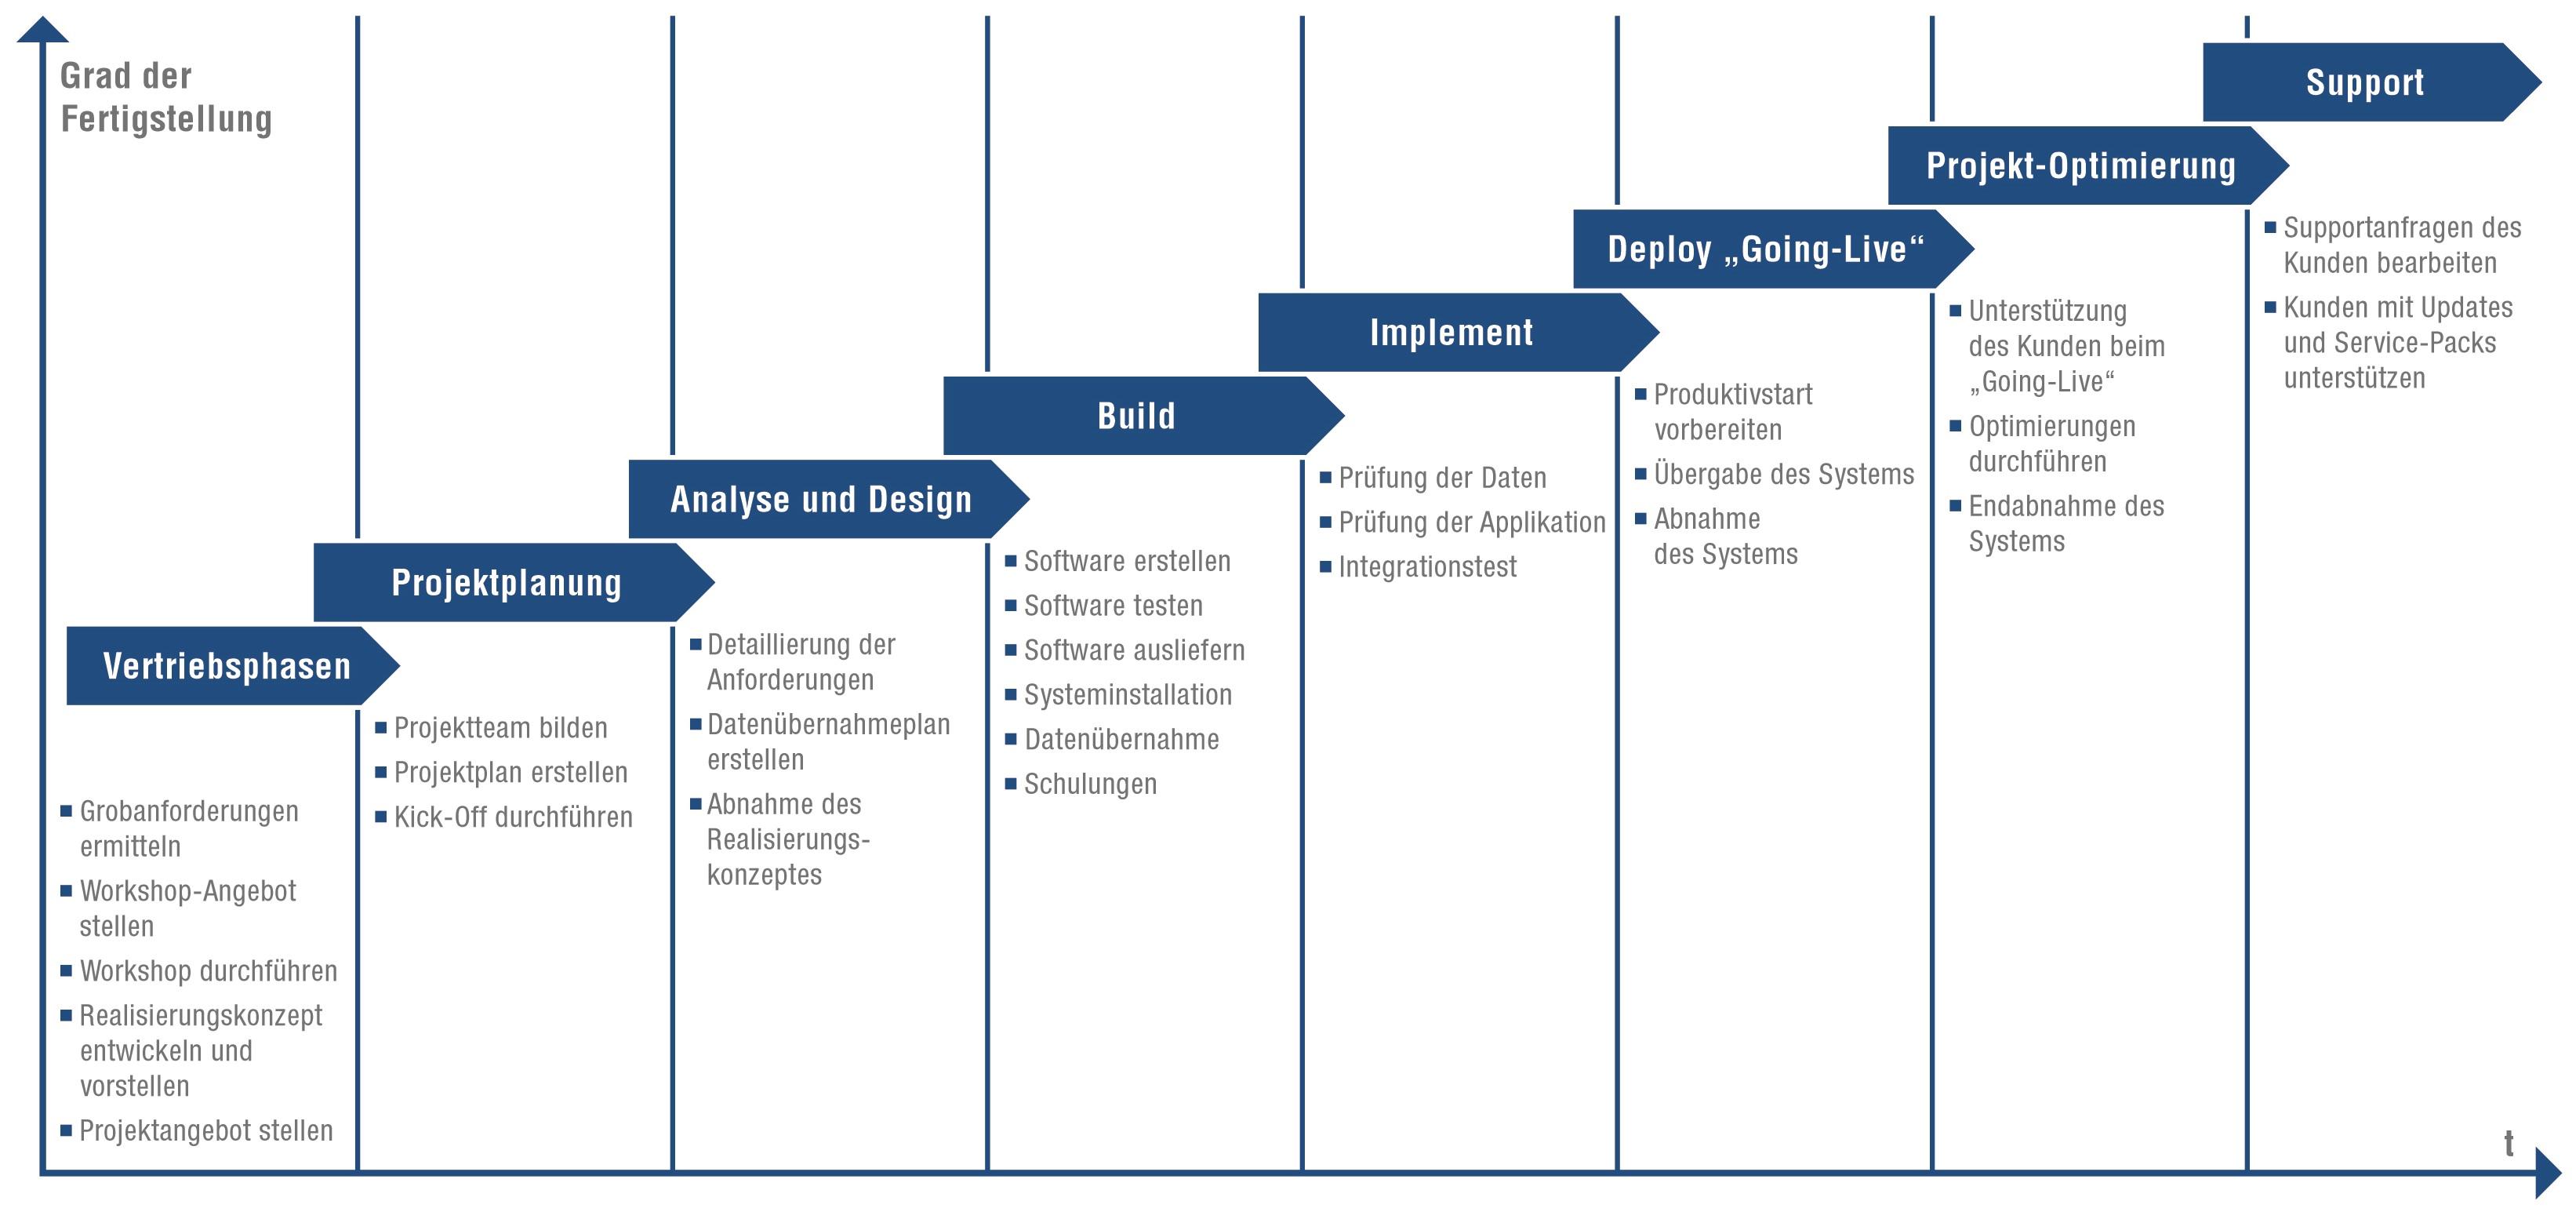 Avantgarde Business Solutions Gmbh Startseite Projektmethodik